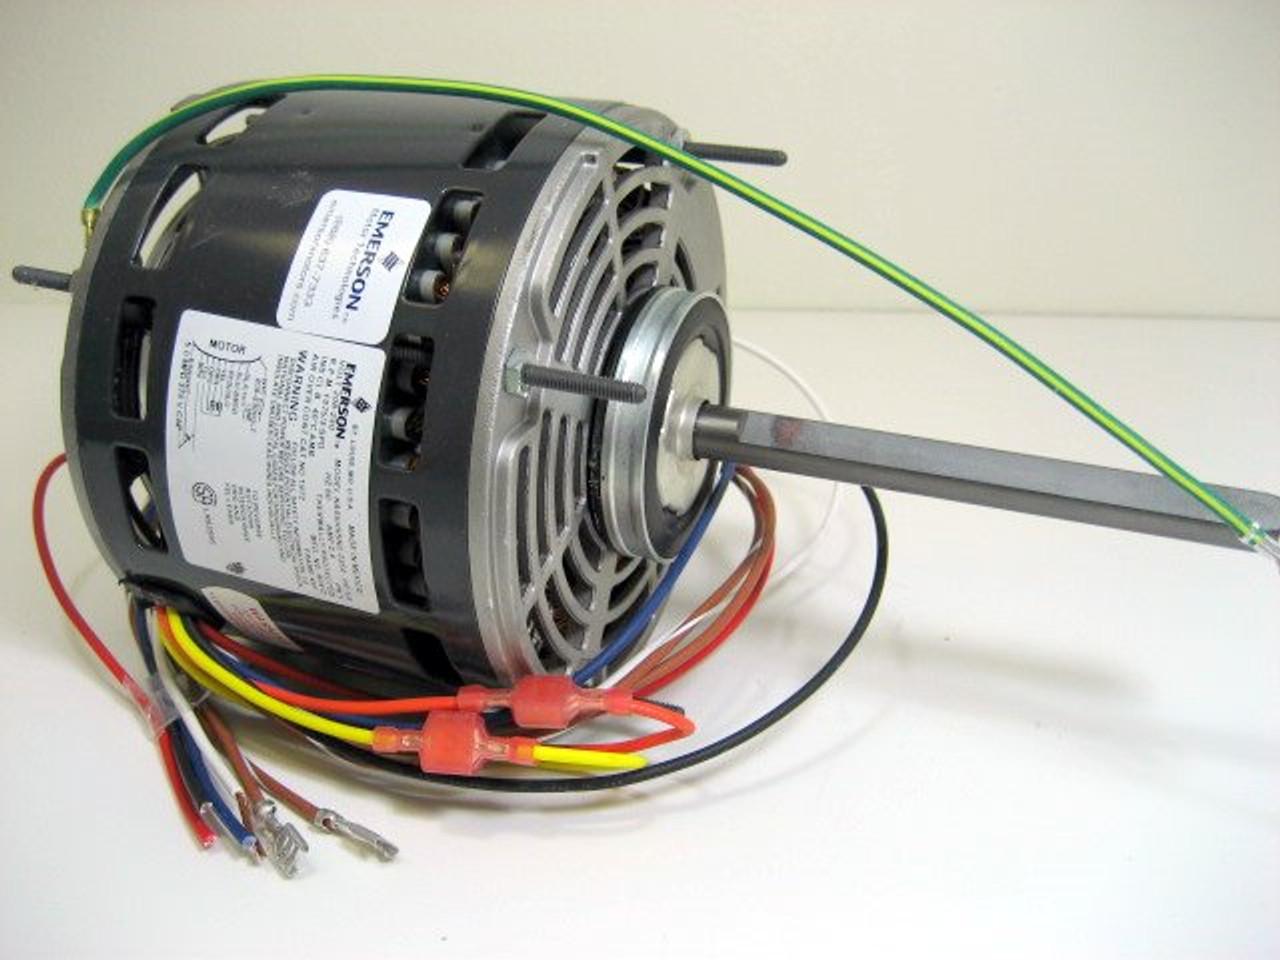 medium resolution of furnace blower motor 1 4 horse power 1075 rpm 115 volt eme1863